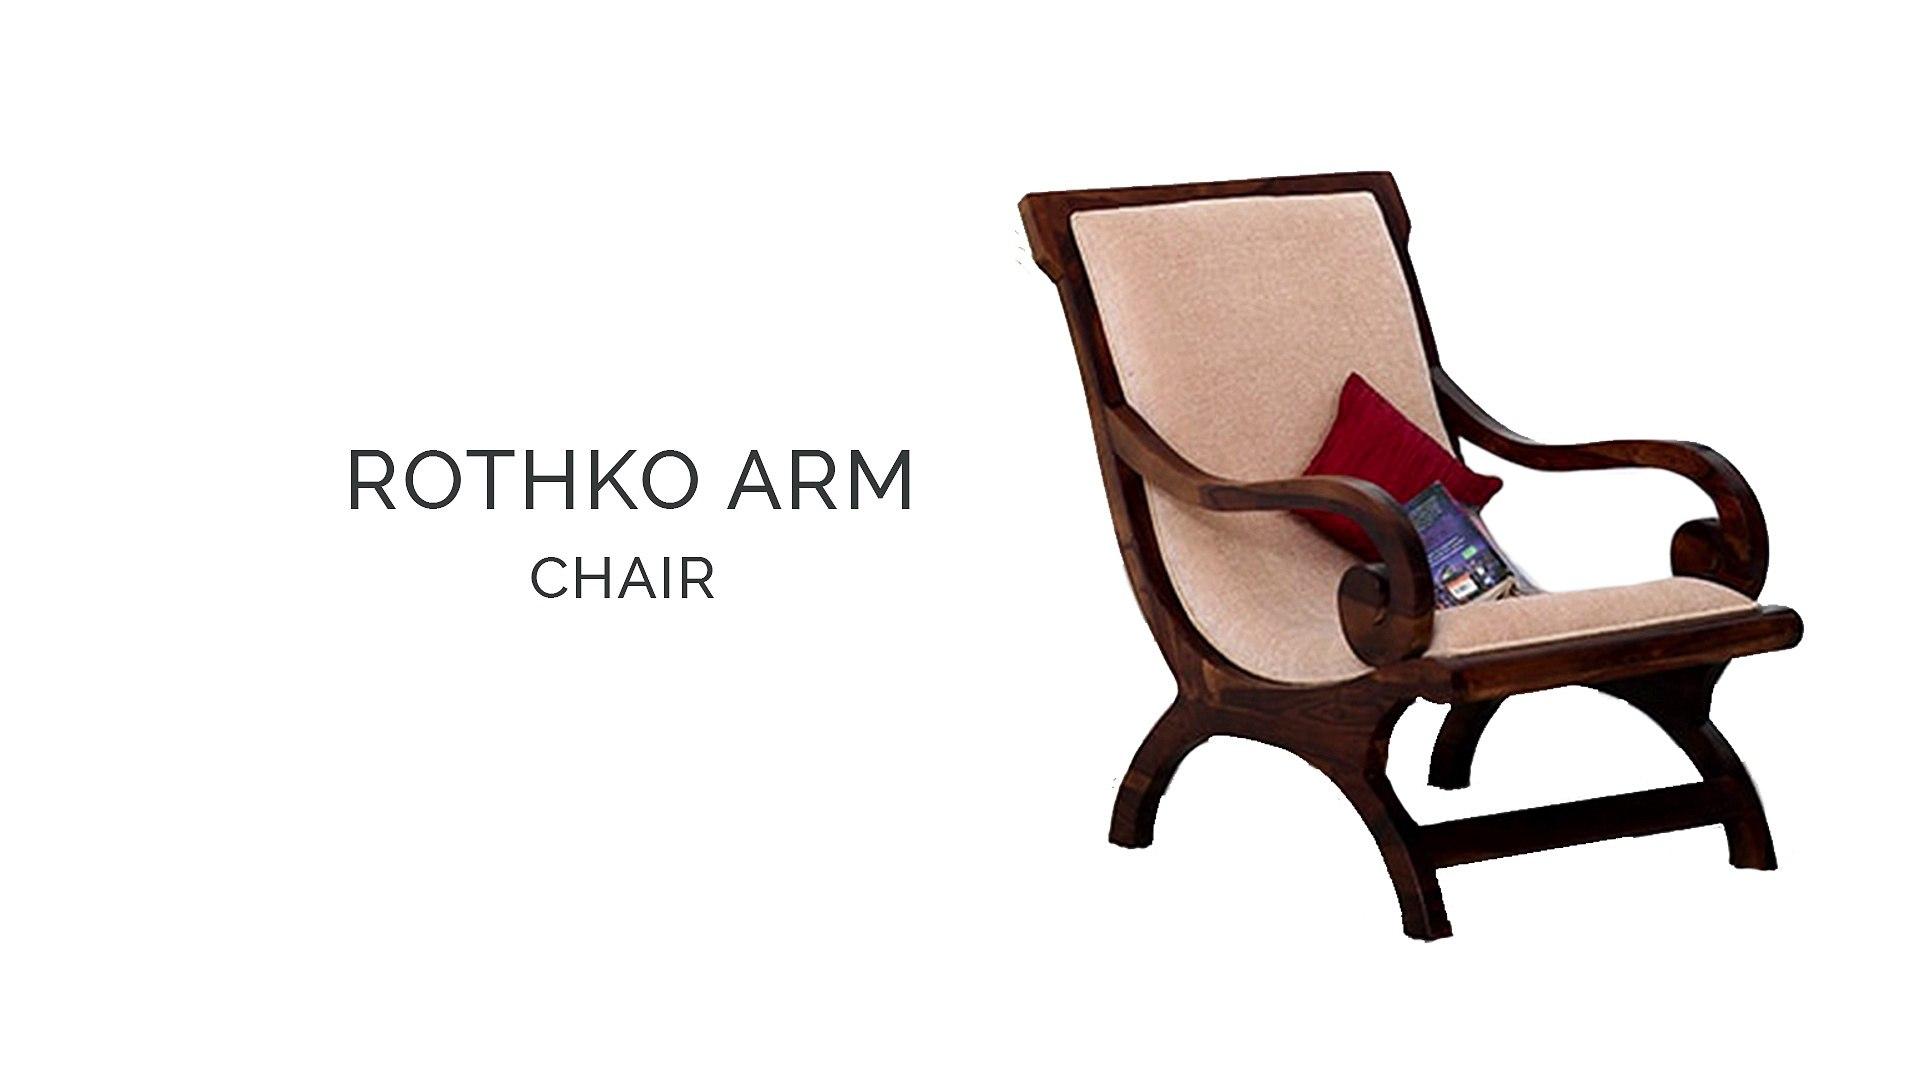 Terrific Arm Chair Rothko Arm Chair Buy Arm Chair Online Pdpeps Interior Chair Design Pdpepsorg